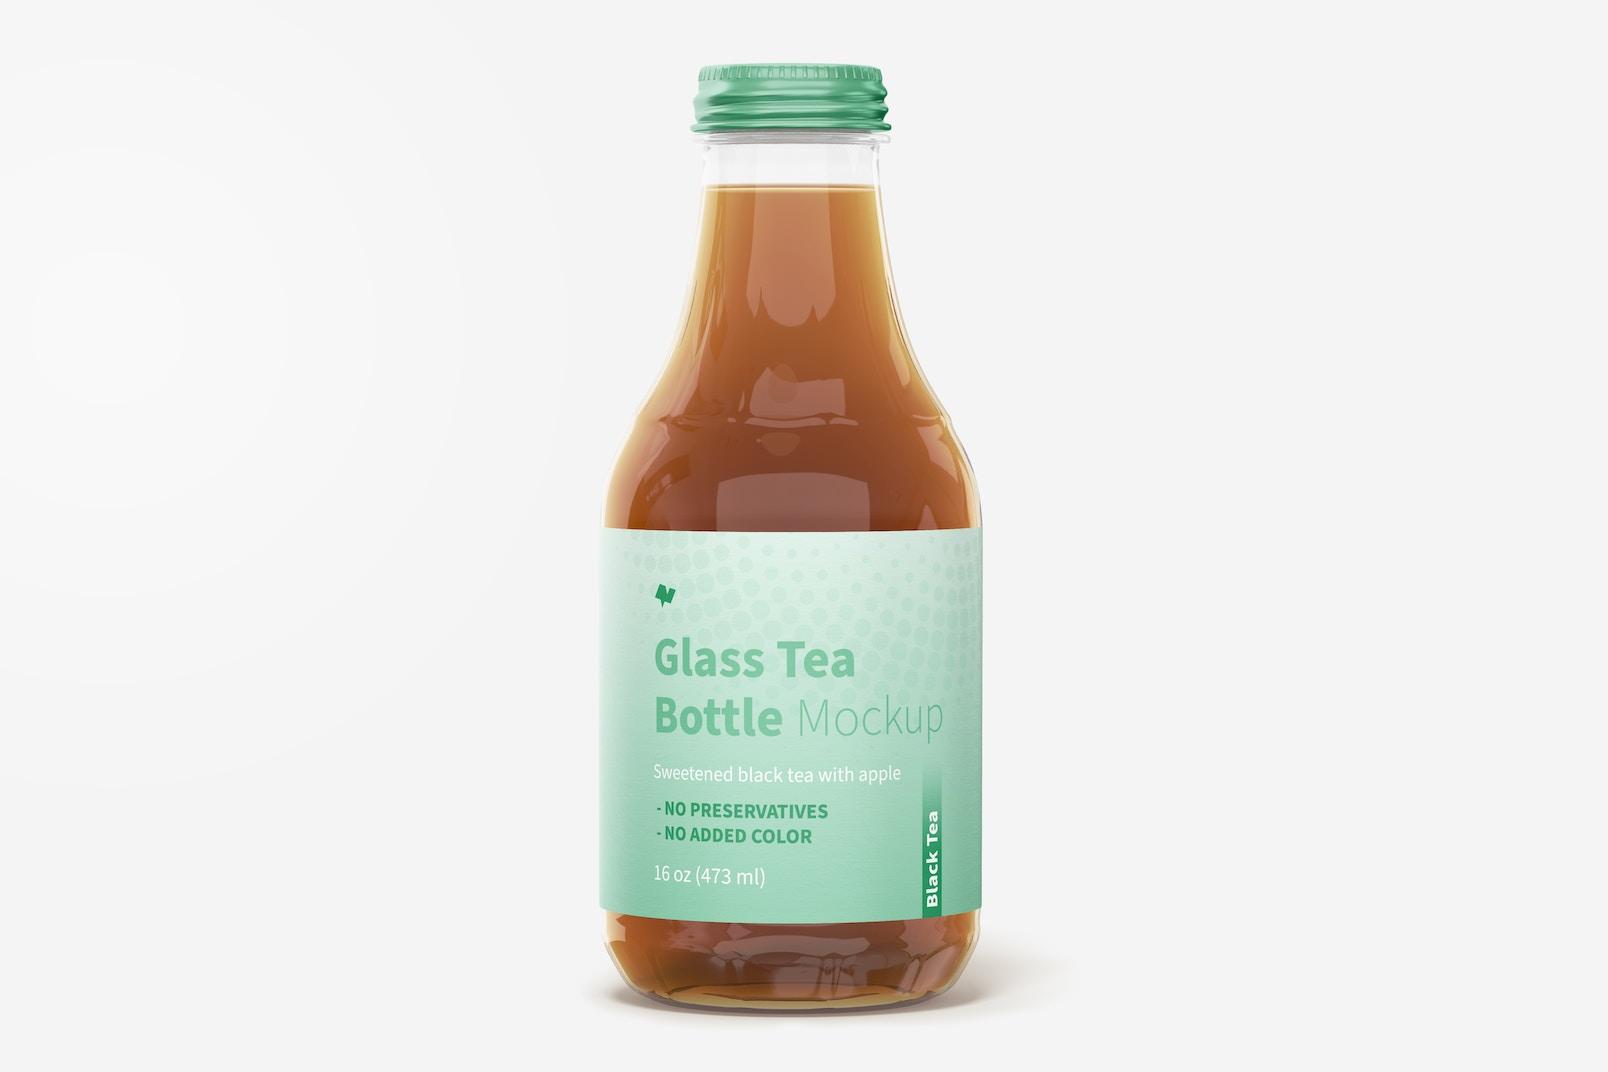 16 oz Glass Tea Bottle Mockup